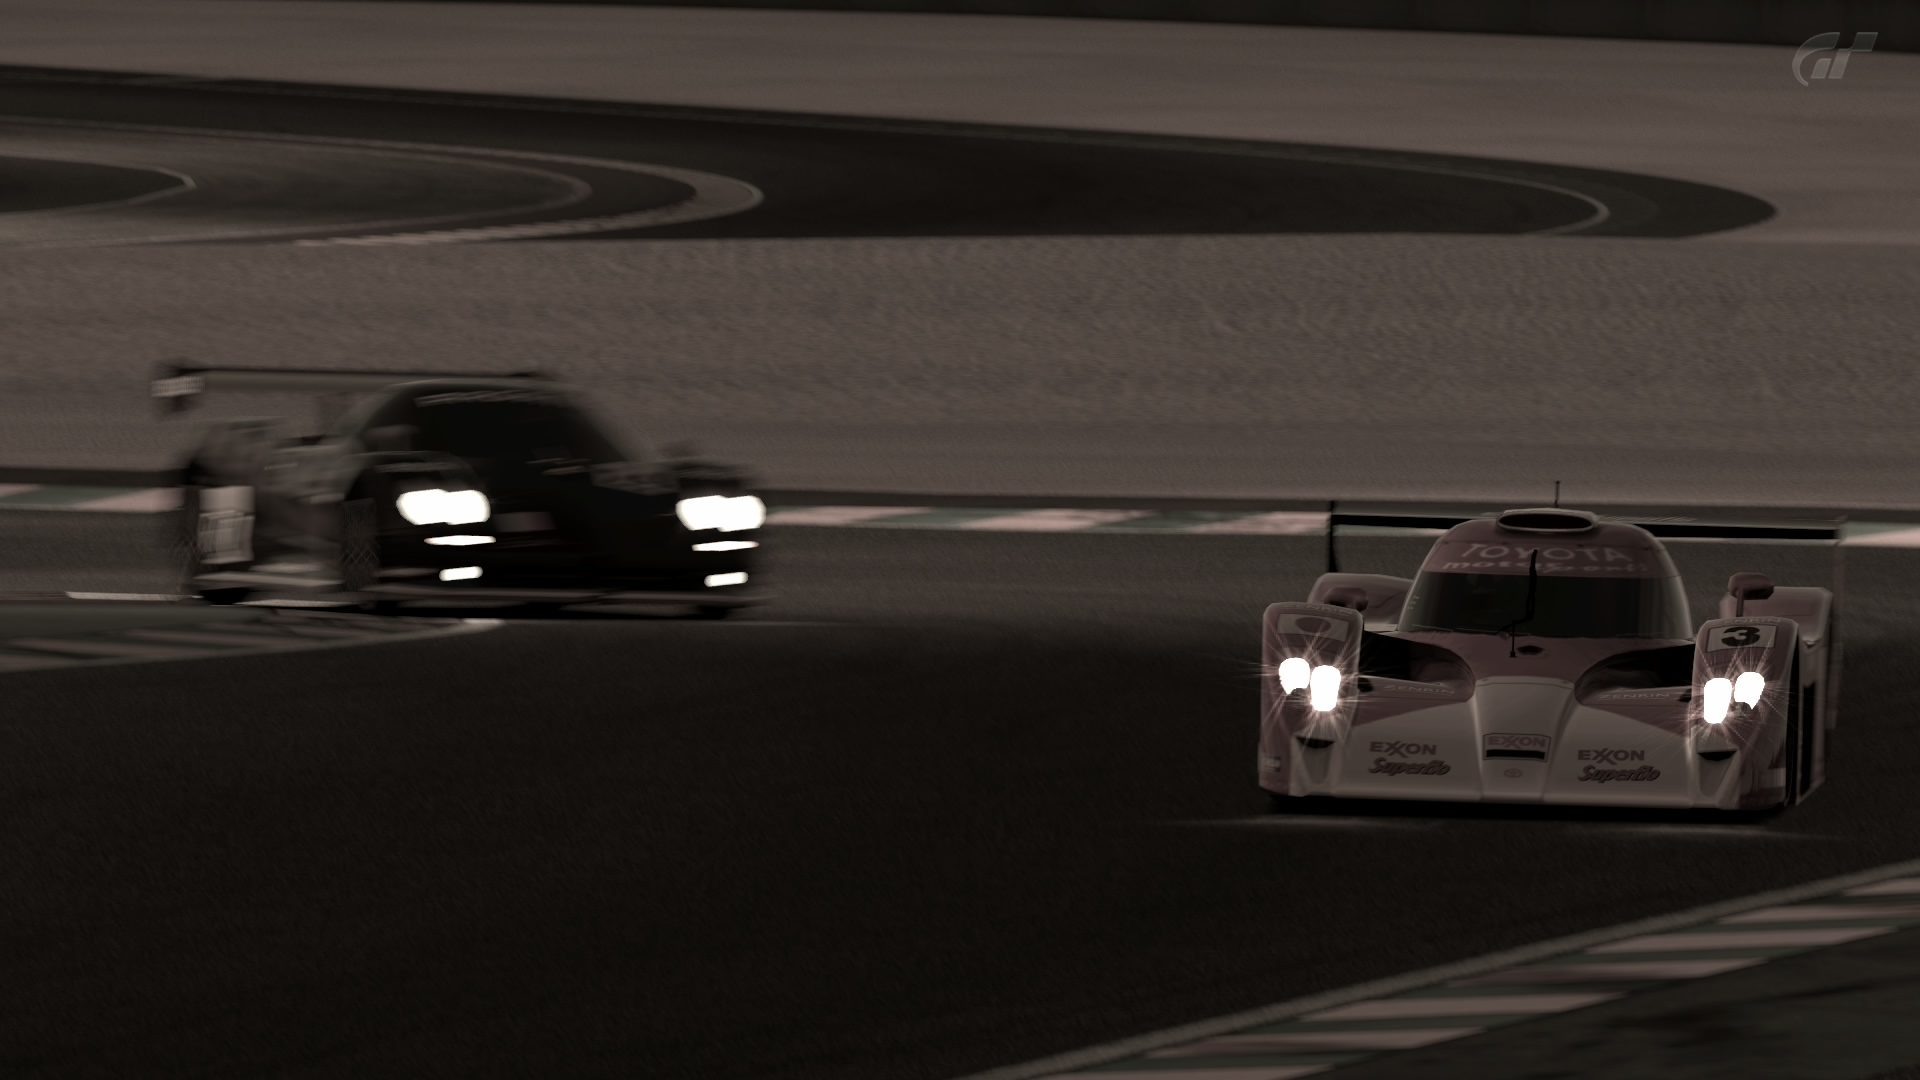 Circuit de la Sarthe 2009_3.jpg